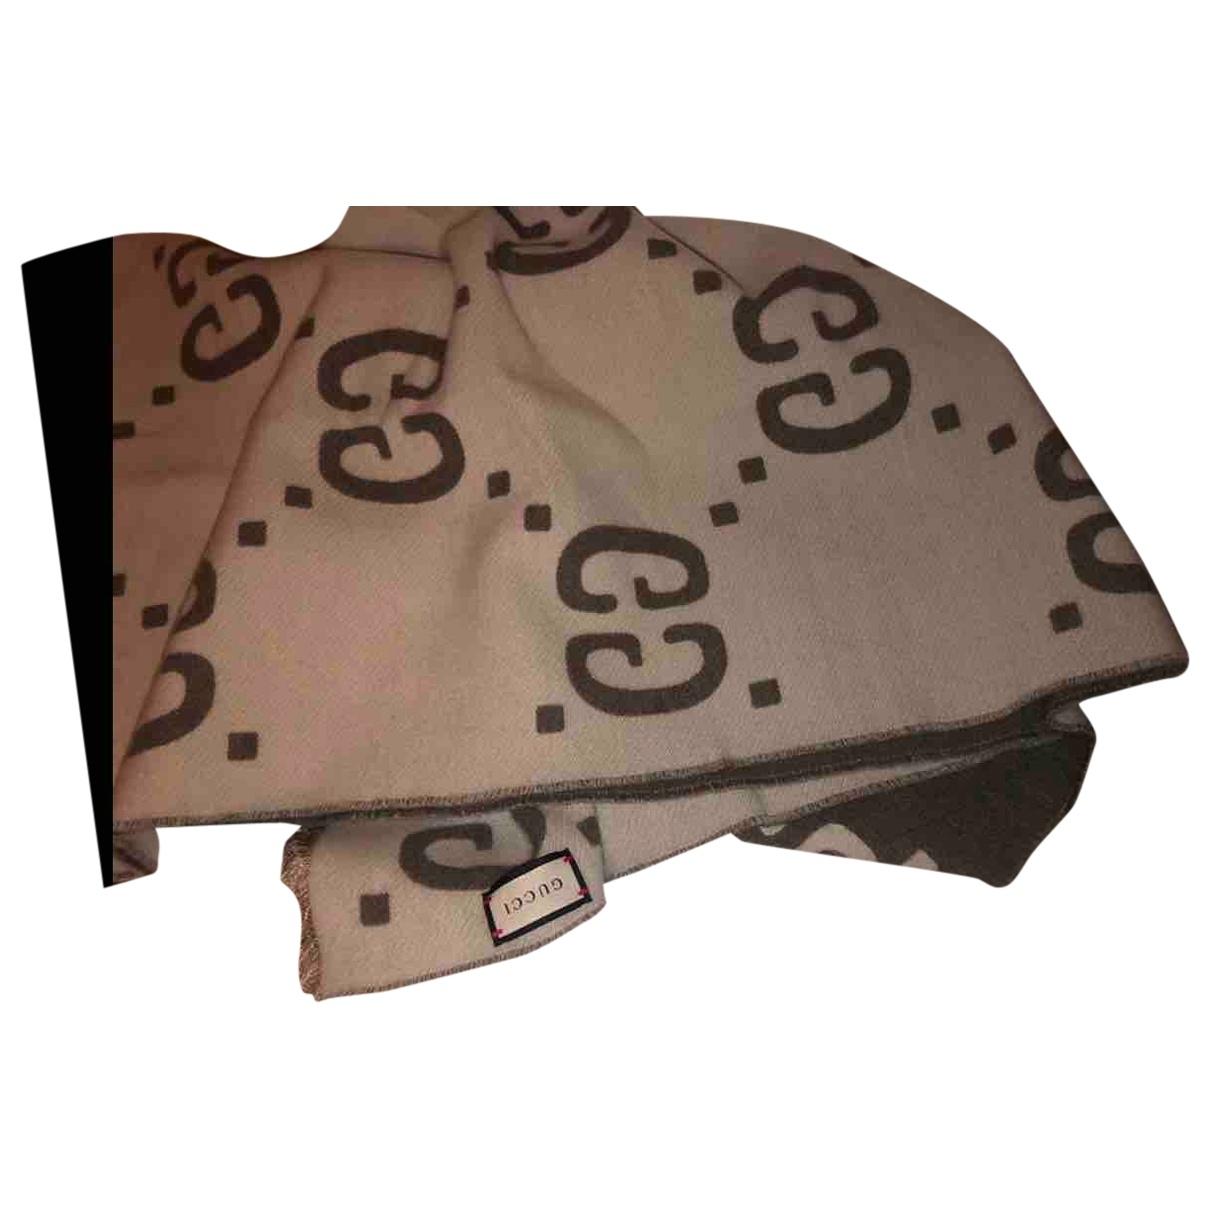 Gucci \N Beige Cotton scarf for Women \N